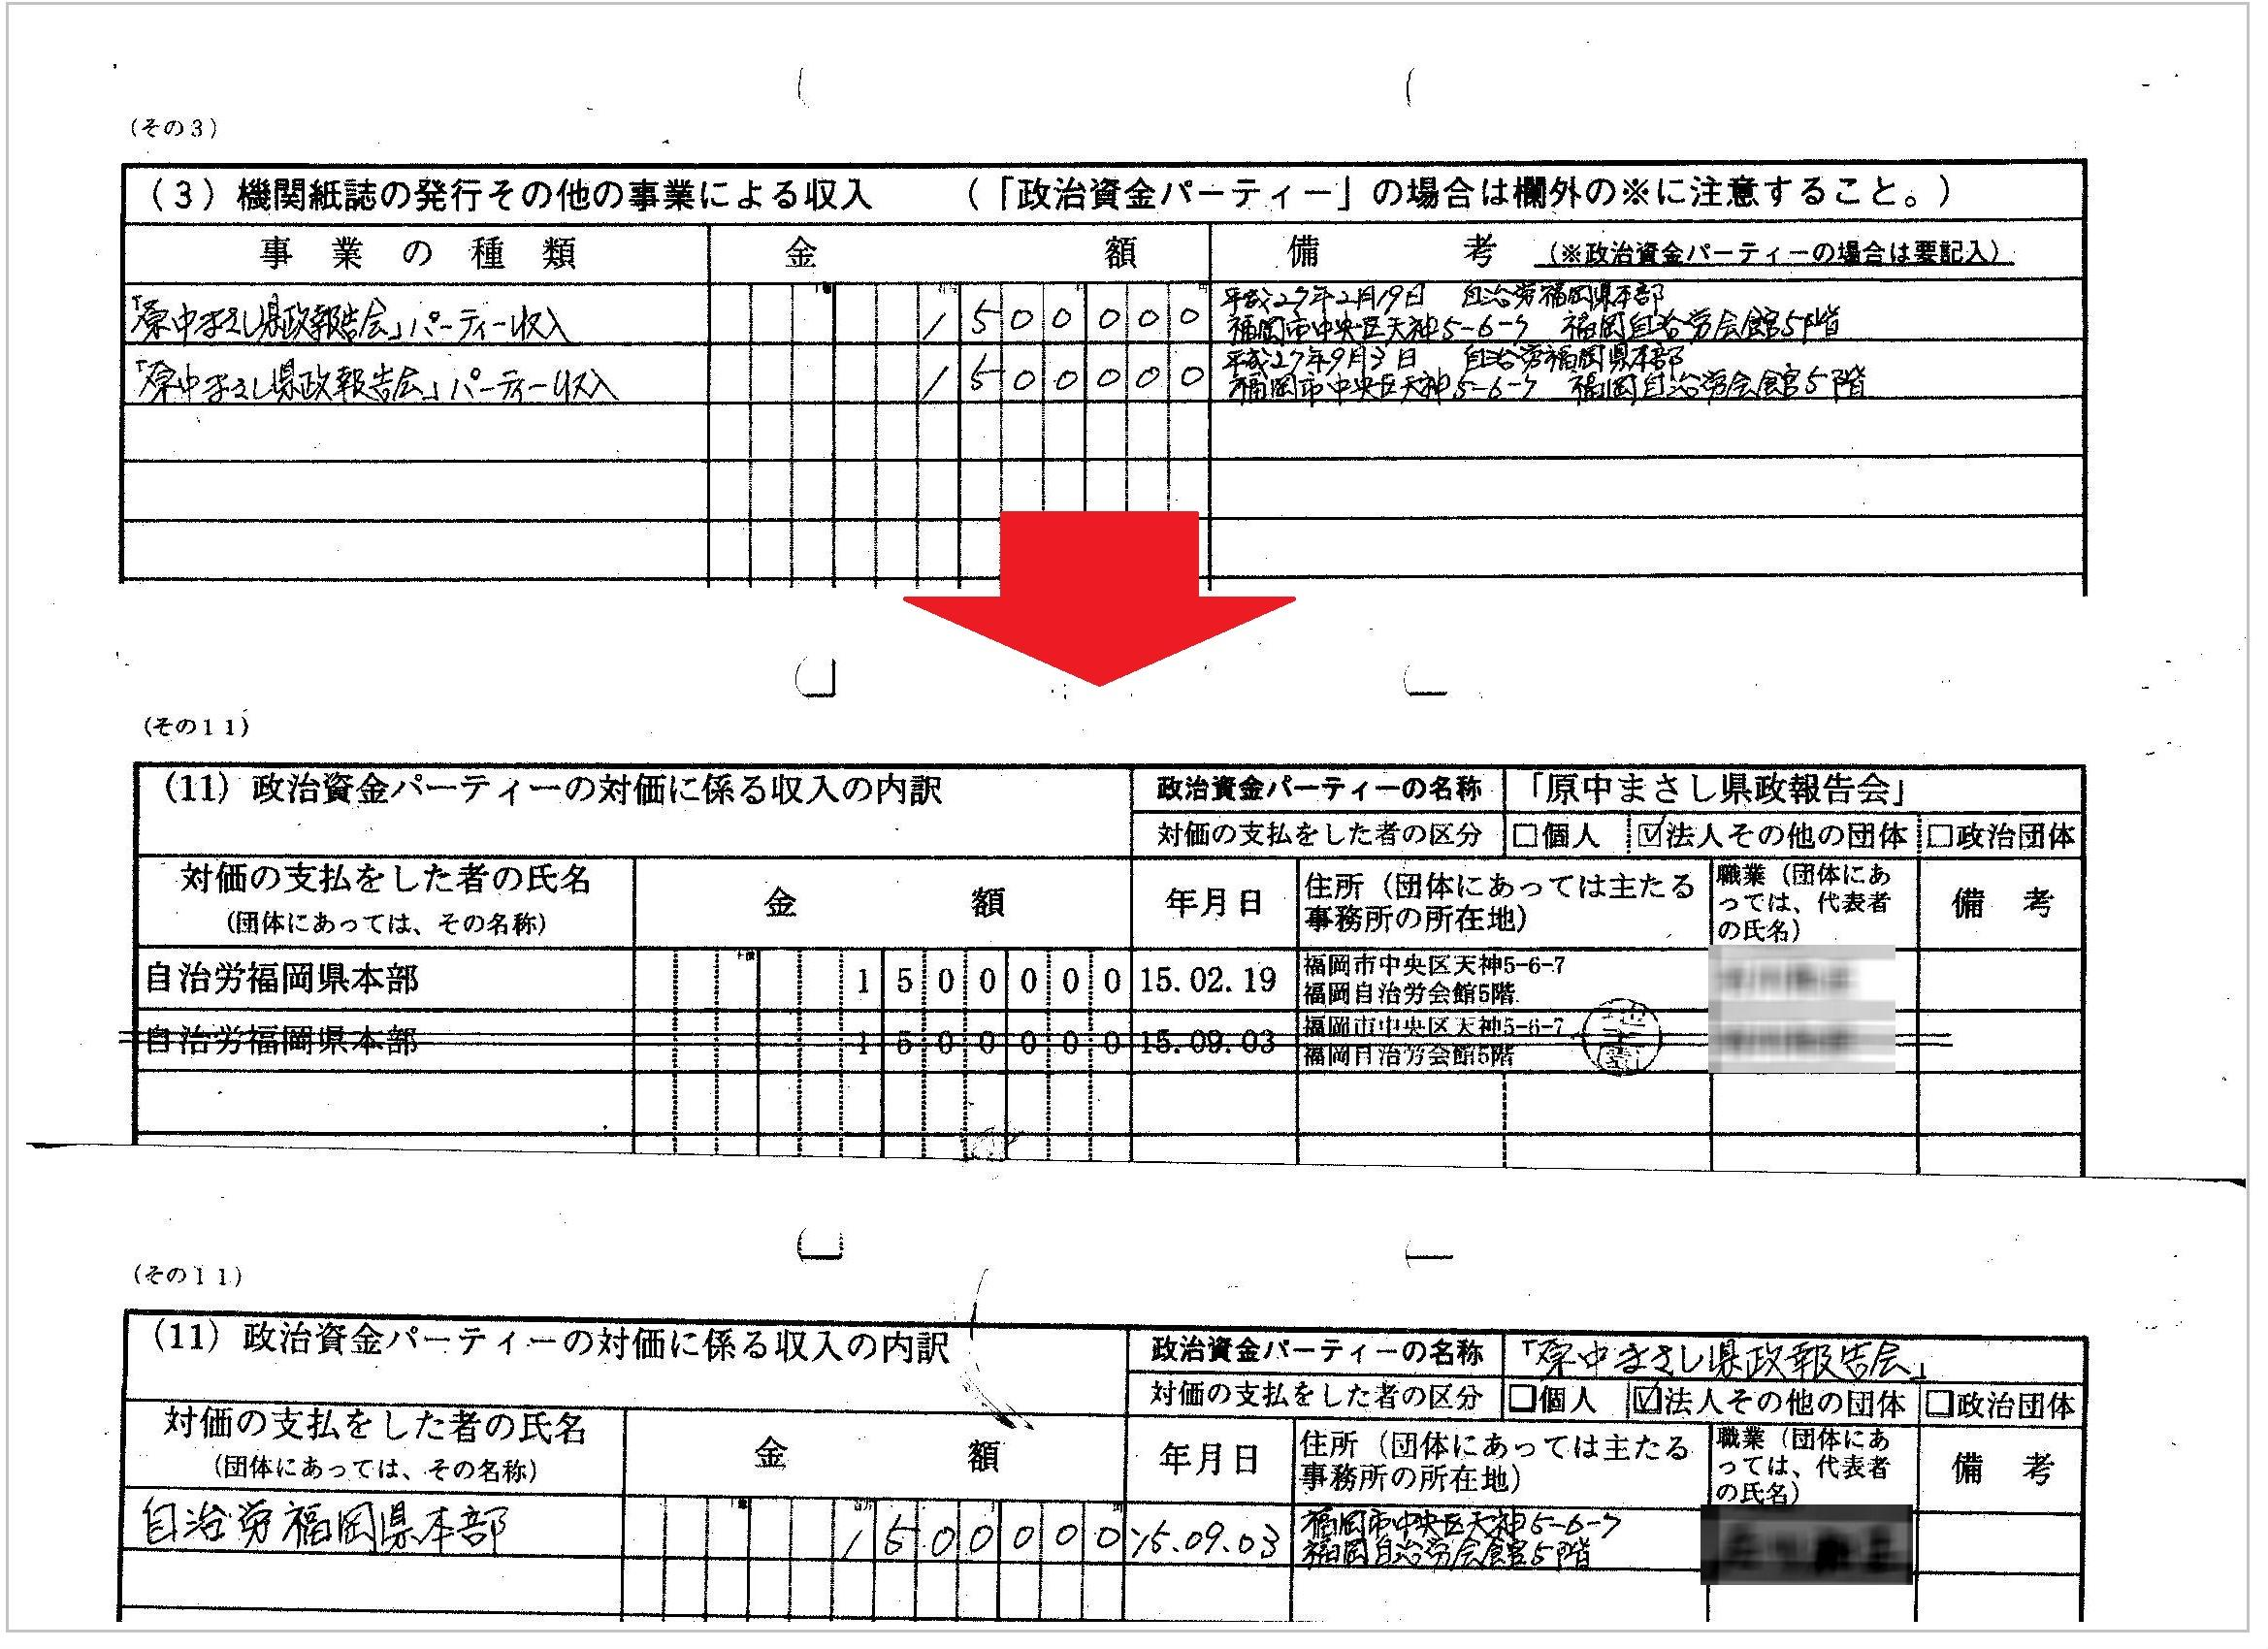 http://hunter-investigate.jp/news/2991a72027dc1061f6e324506f1263b0547eab6c.jpg